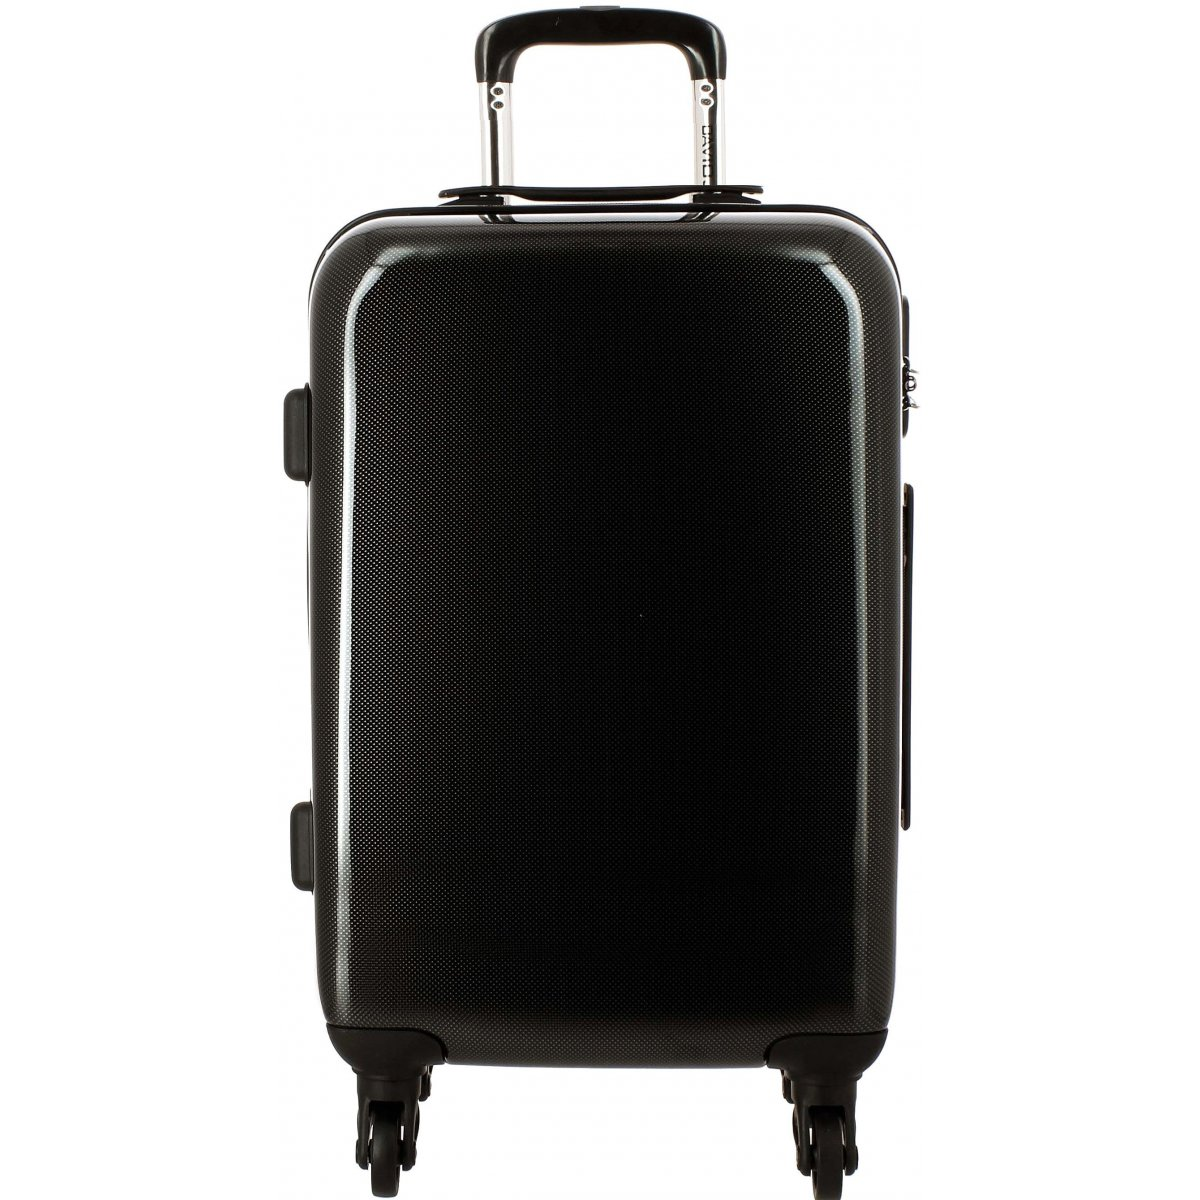 valise rigide david jones taille m 66cm ba20601m couleur principale black squares. Black Bedroom Furniture Sets. Home Design Ideas